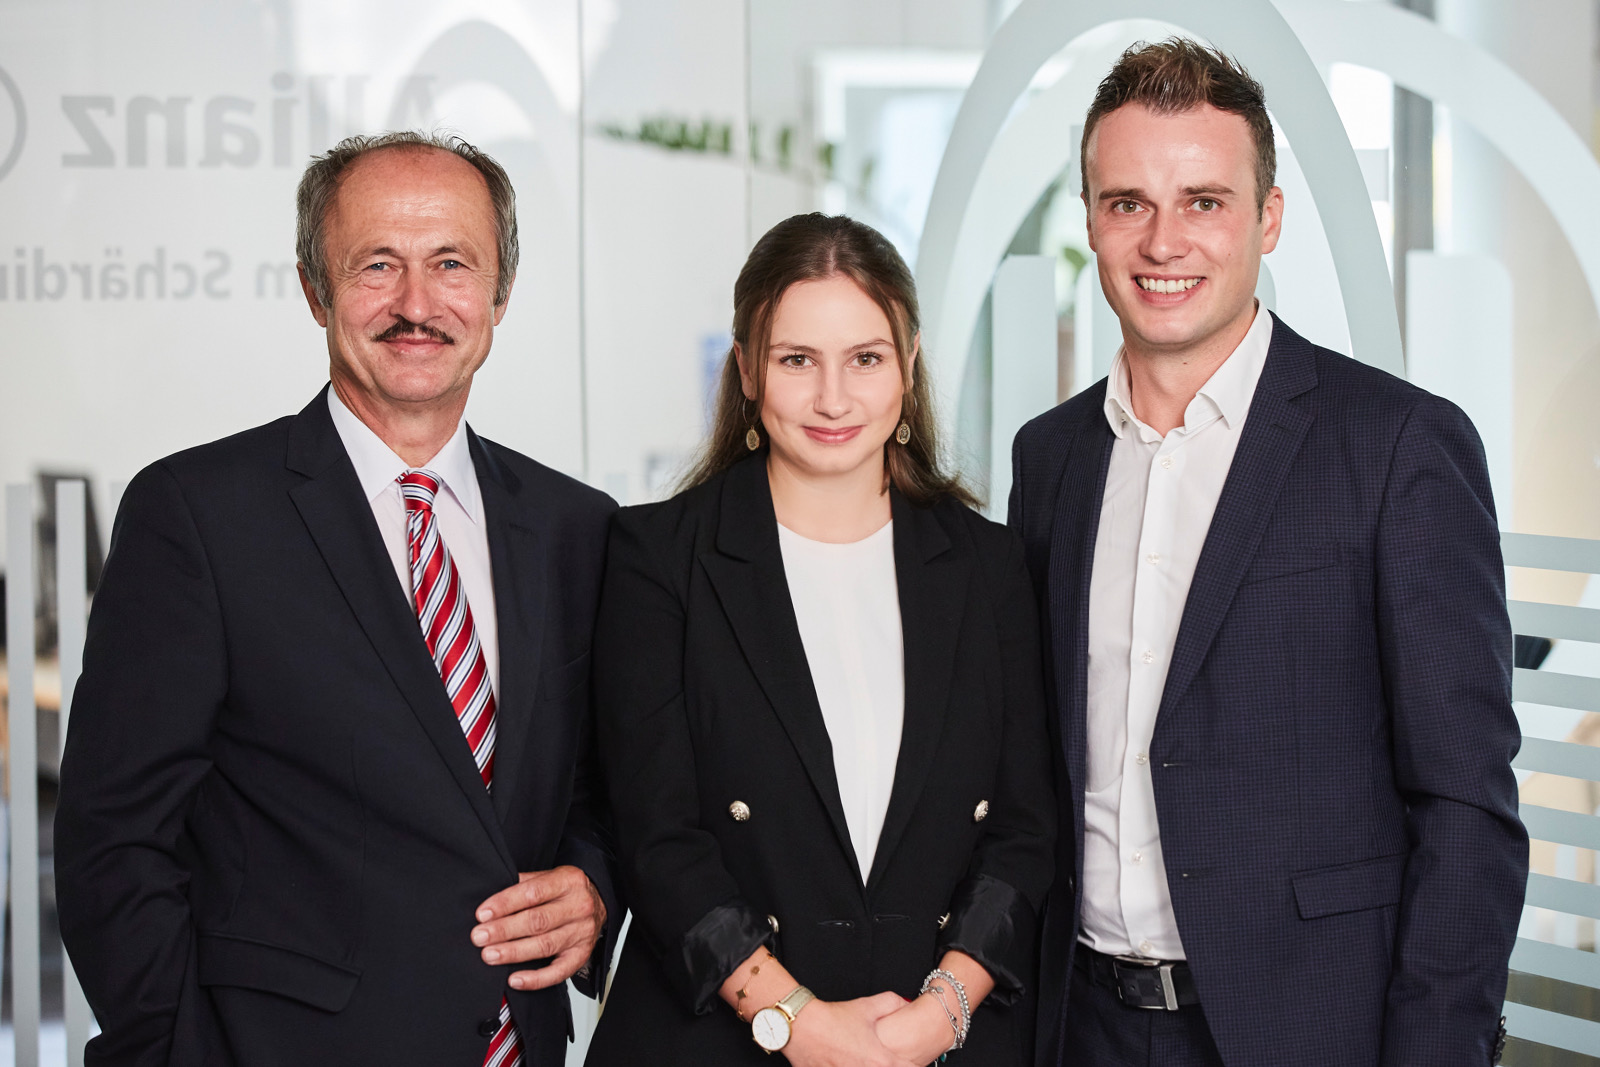 Teamfoto Agentur I und H: Johann Lengauer, Patricia Antesberger, Manuel Hötzeneder